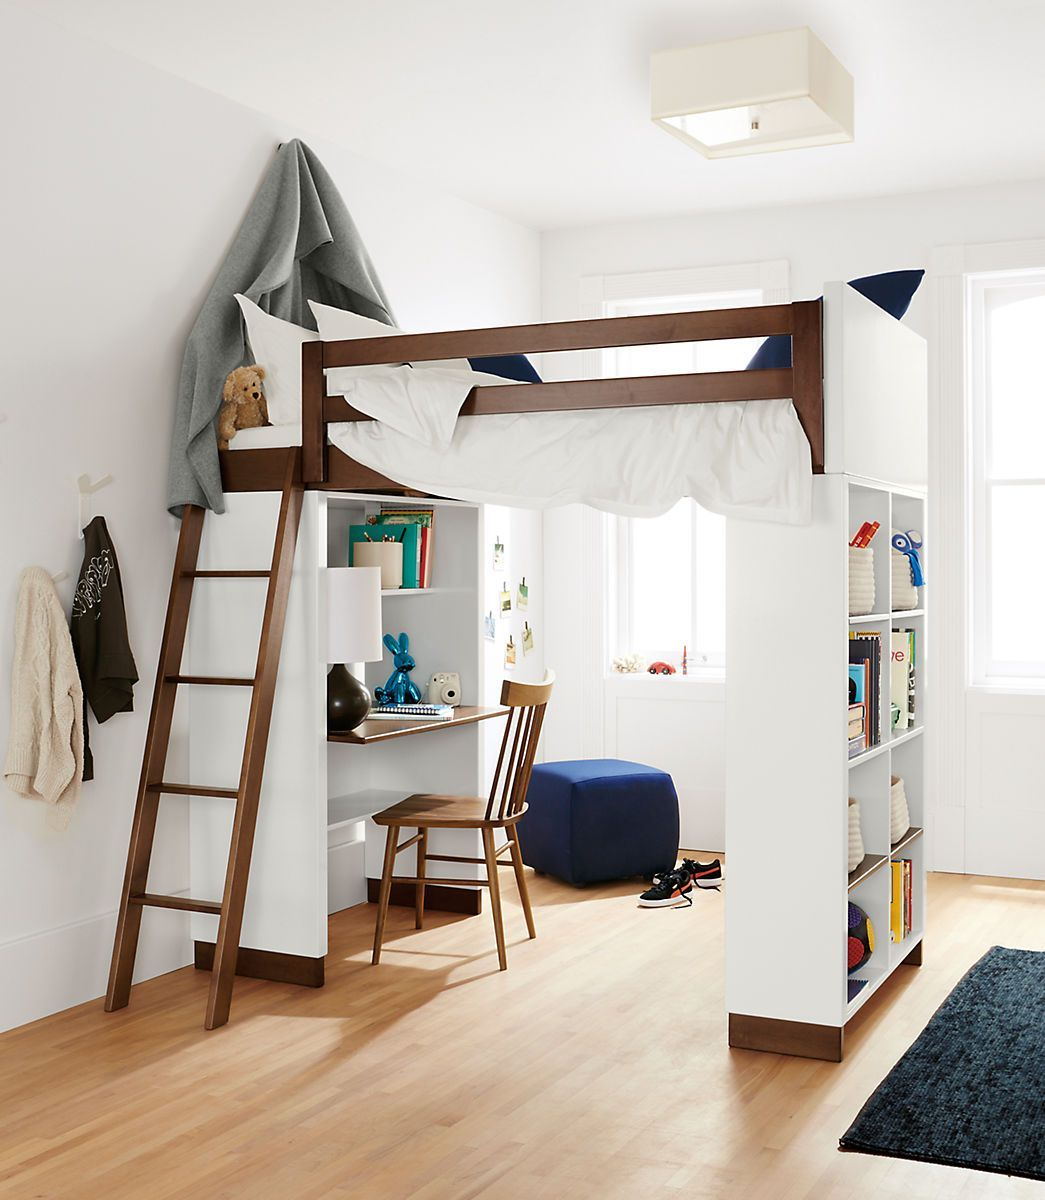 Moda Modern Wood Kids Loft - Moda Loft Beds with Desk and Bookcase